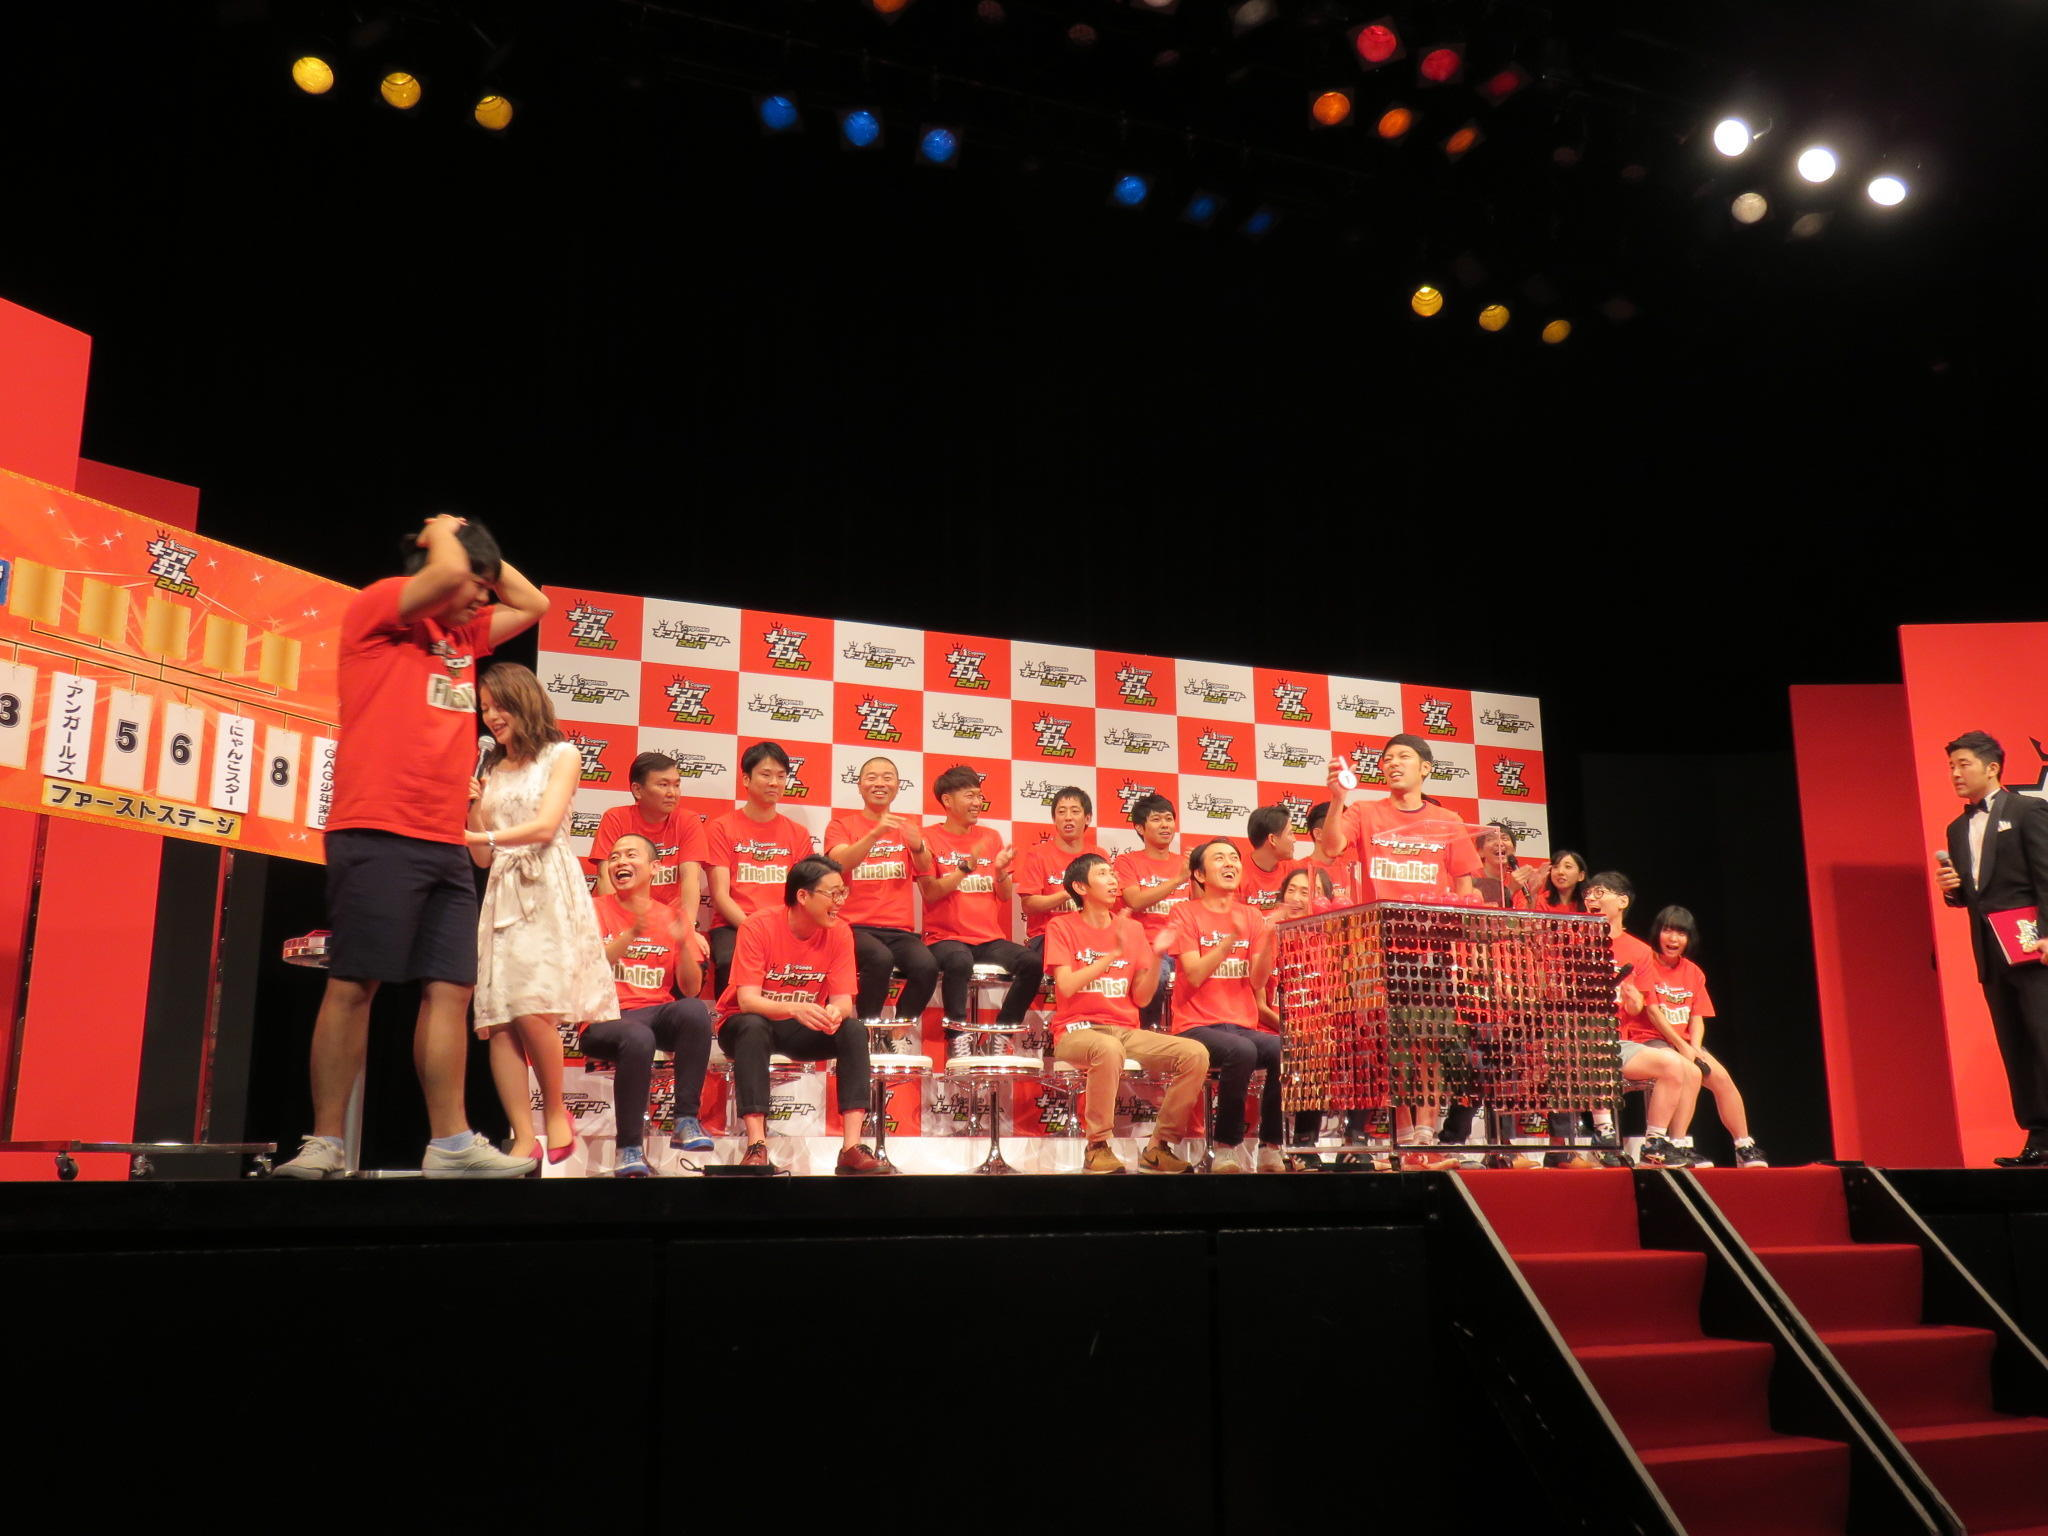 http://news.yoshimoto.co.jp/20170909005327-ca133ddc7cd08737f34f99f7d7e53fc93e088c0c.jpg